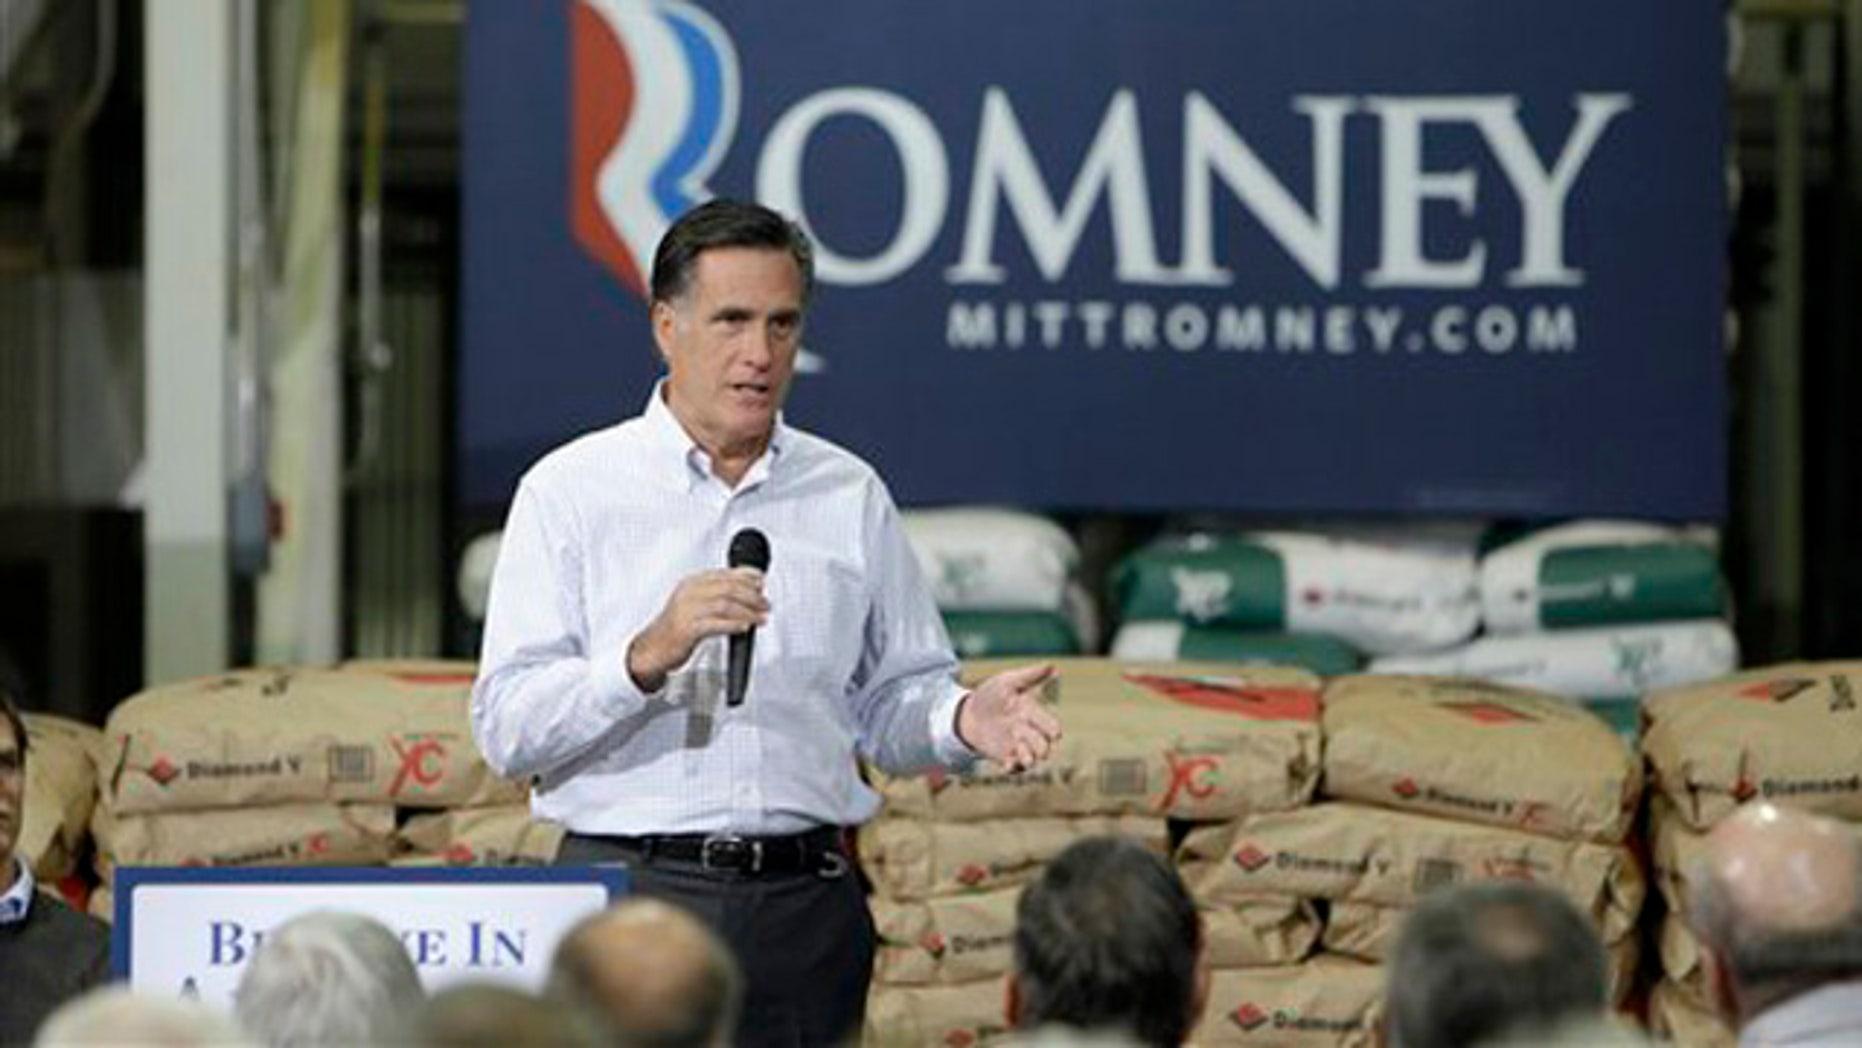 Dec. 9, 2011: Former Massachusetts Gov. Mitt Romney speaks during a town hall meeting in Cedar Rapids, Iowa.